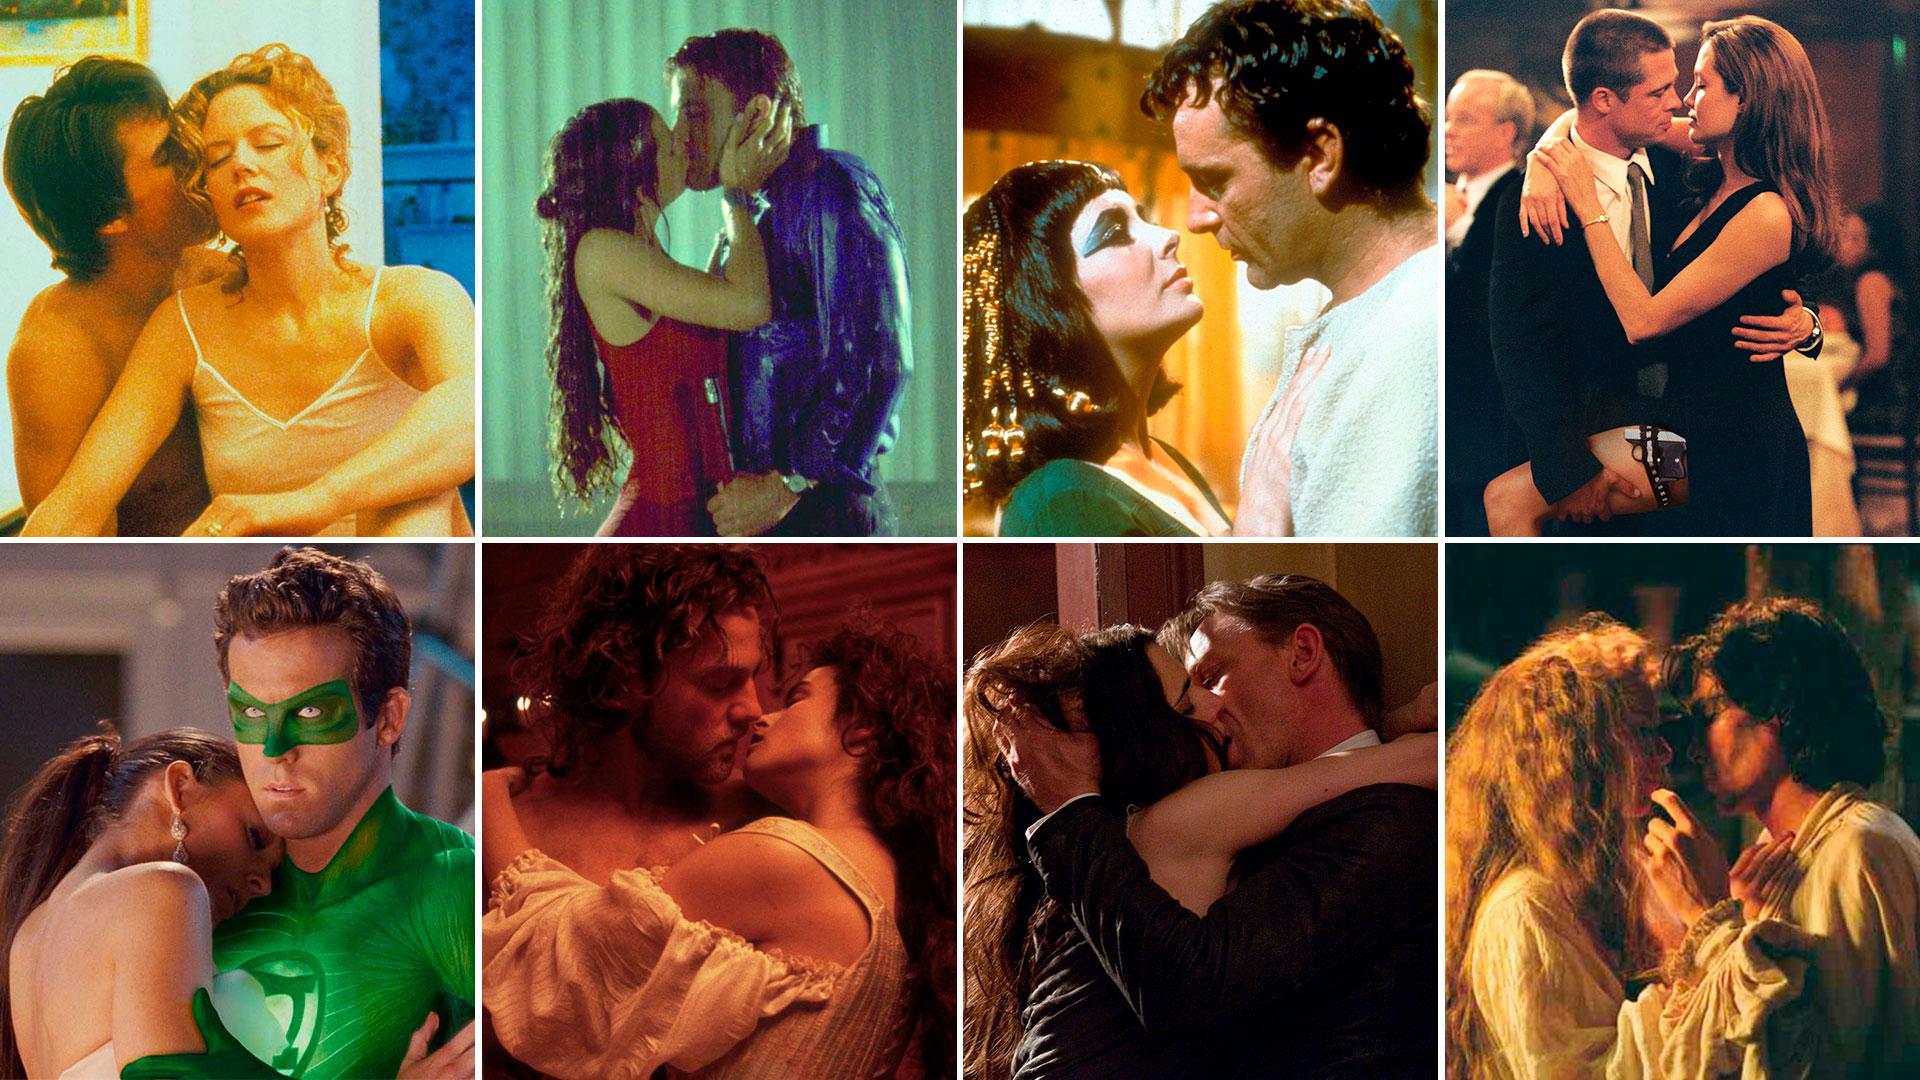 Alta Infidelidad Pelicula Completa pasiones e infidelidades en hollywood: películas que